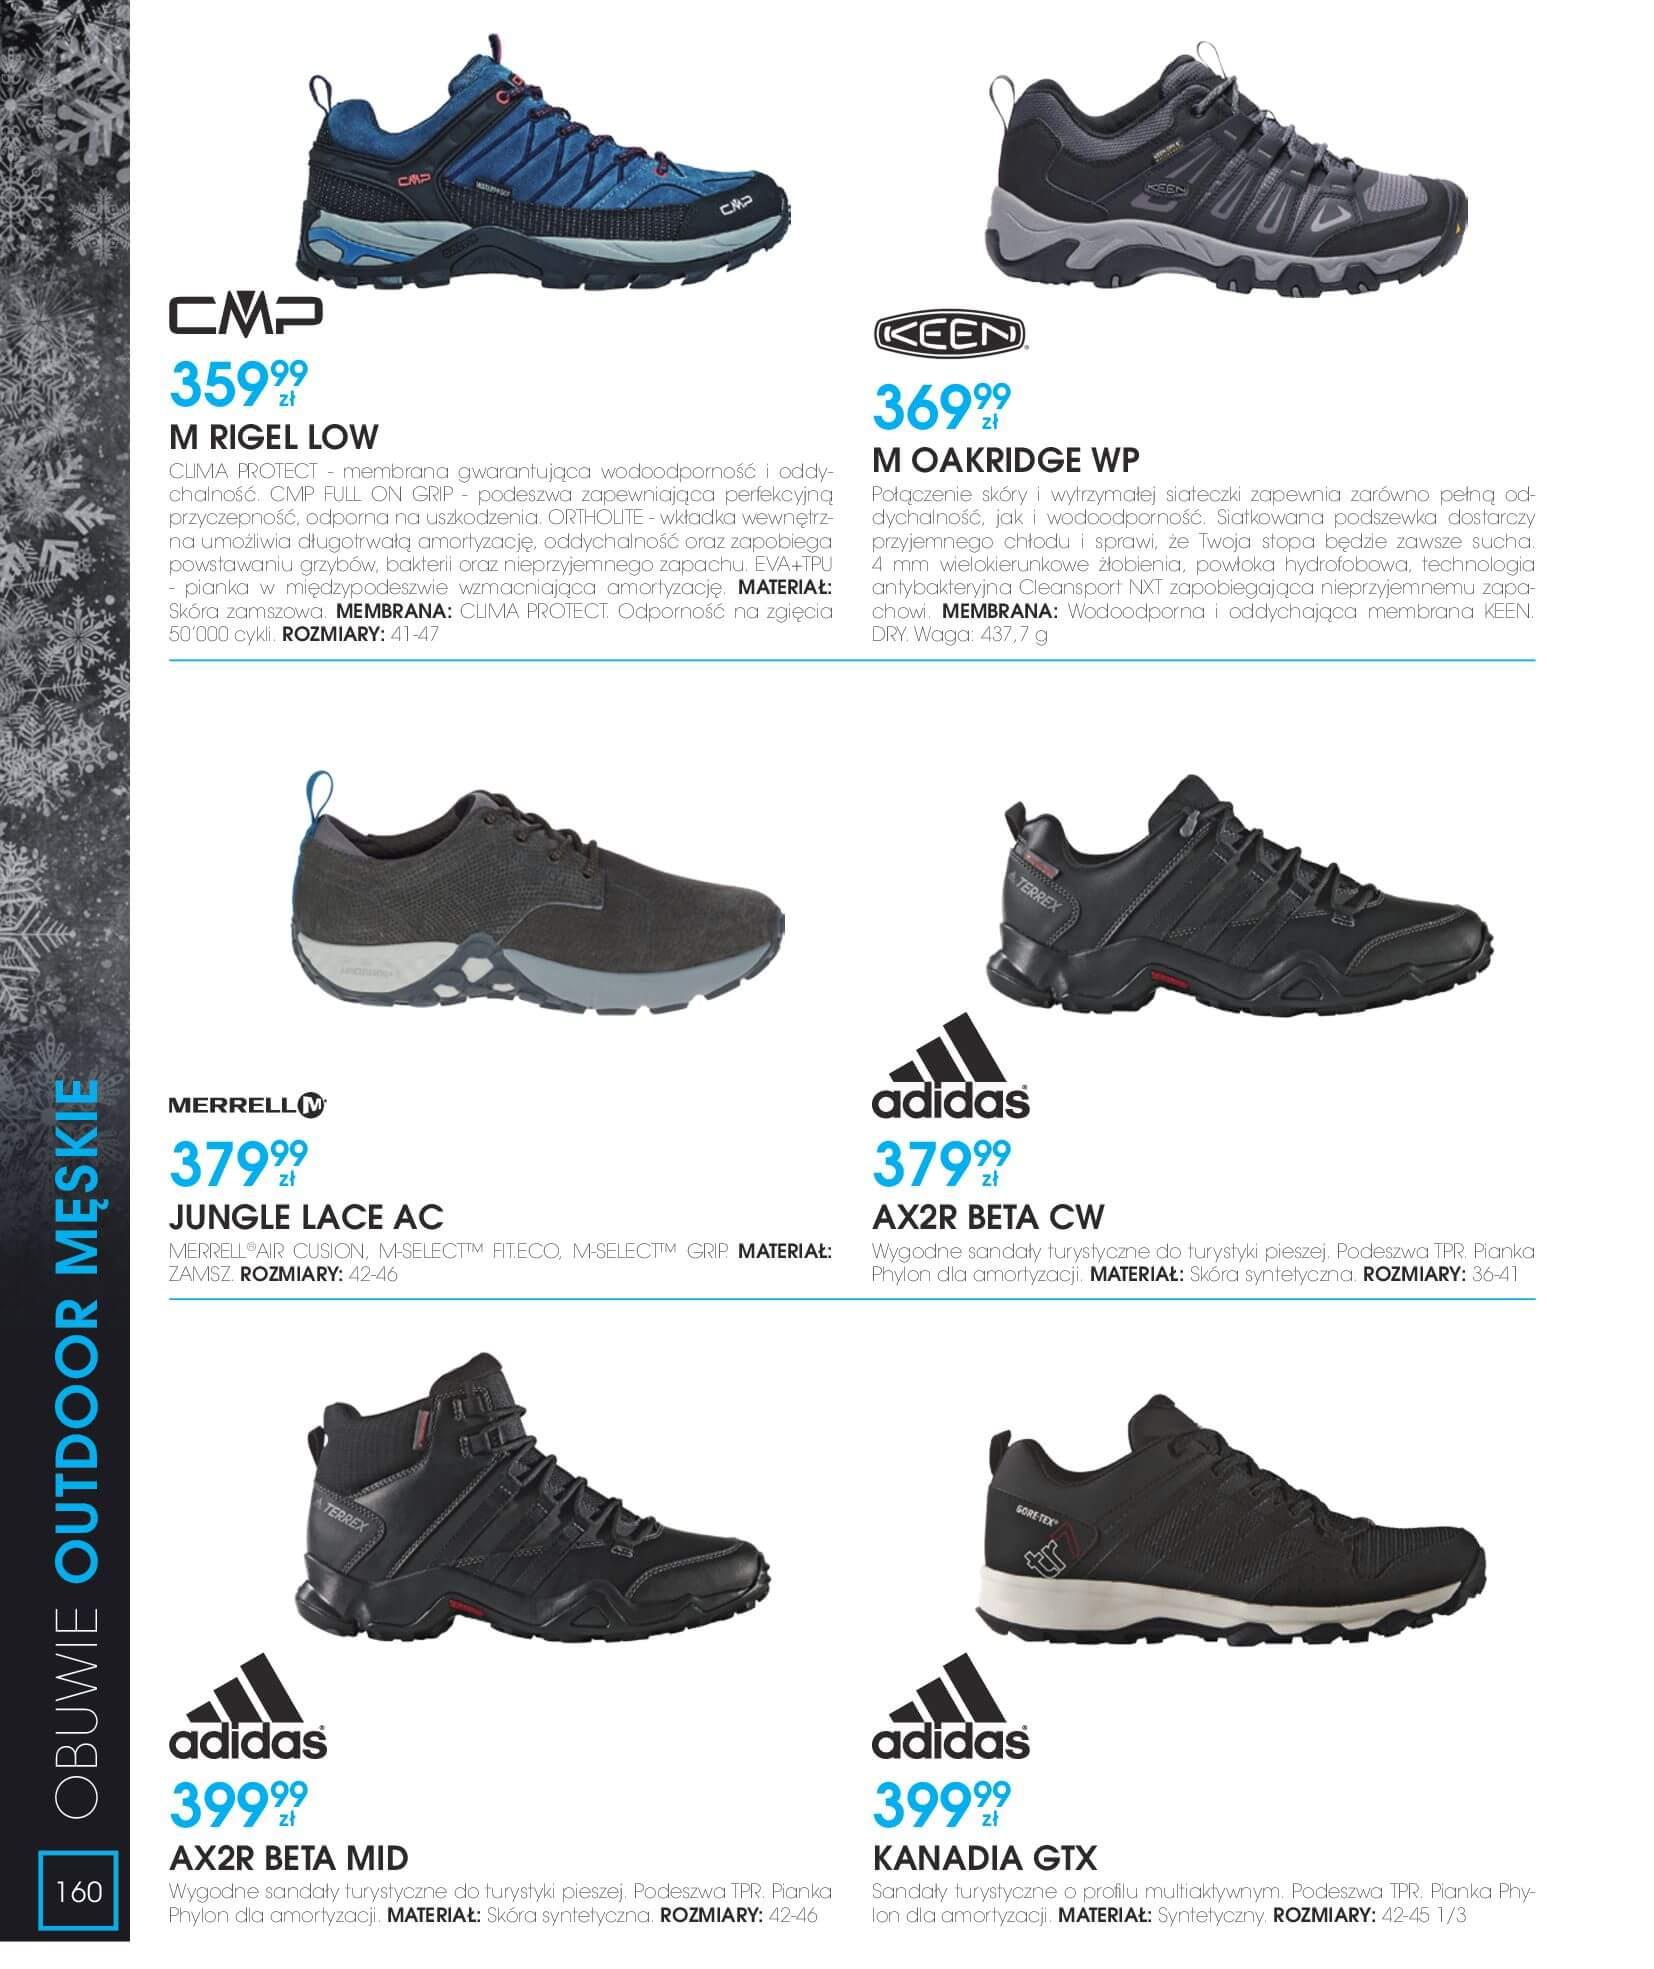 Gazetka Go Sport - Katalog Zima 2017/2018-12.11.2017-28.02.2018-page-160